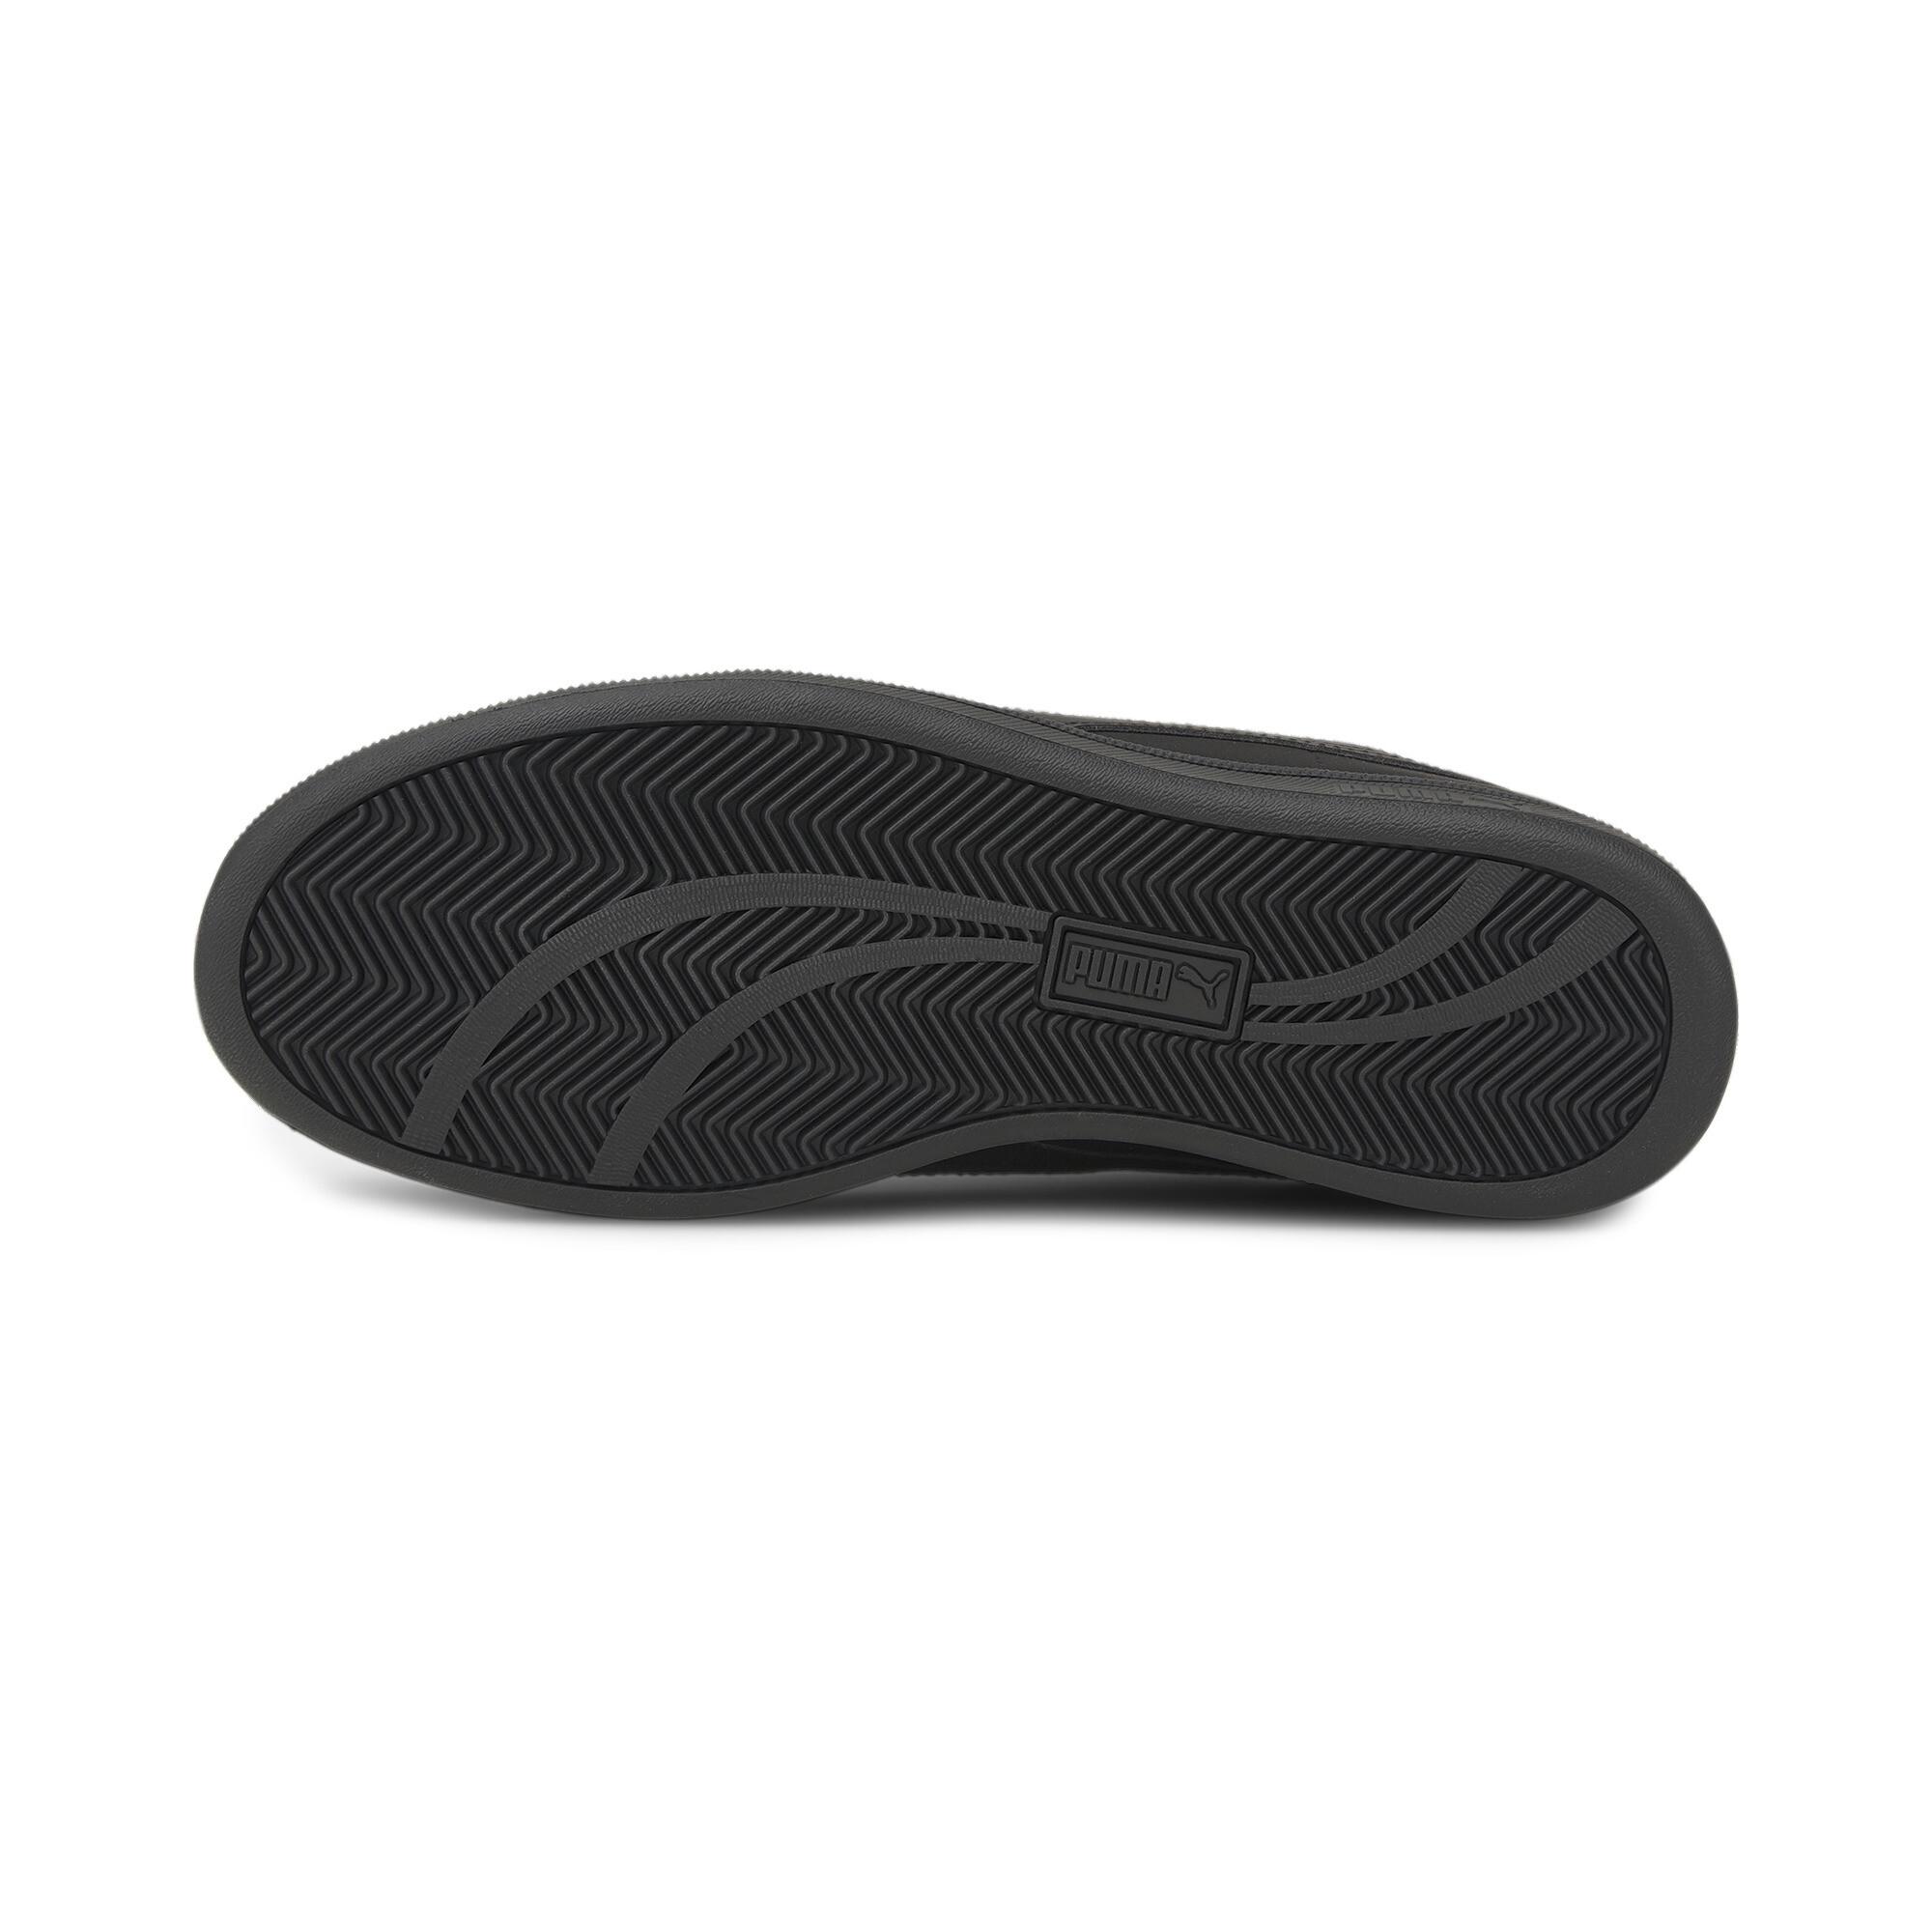 Indexbild 10 - PUMA Smash Buck Sneaker Unisex Schuhe Sport Classics Neu